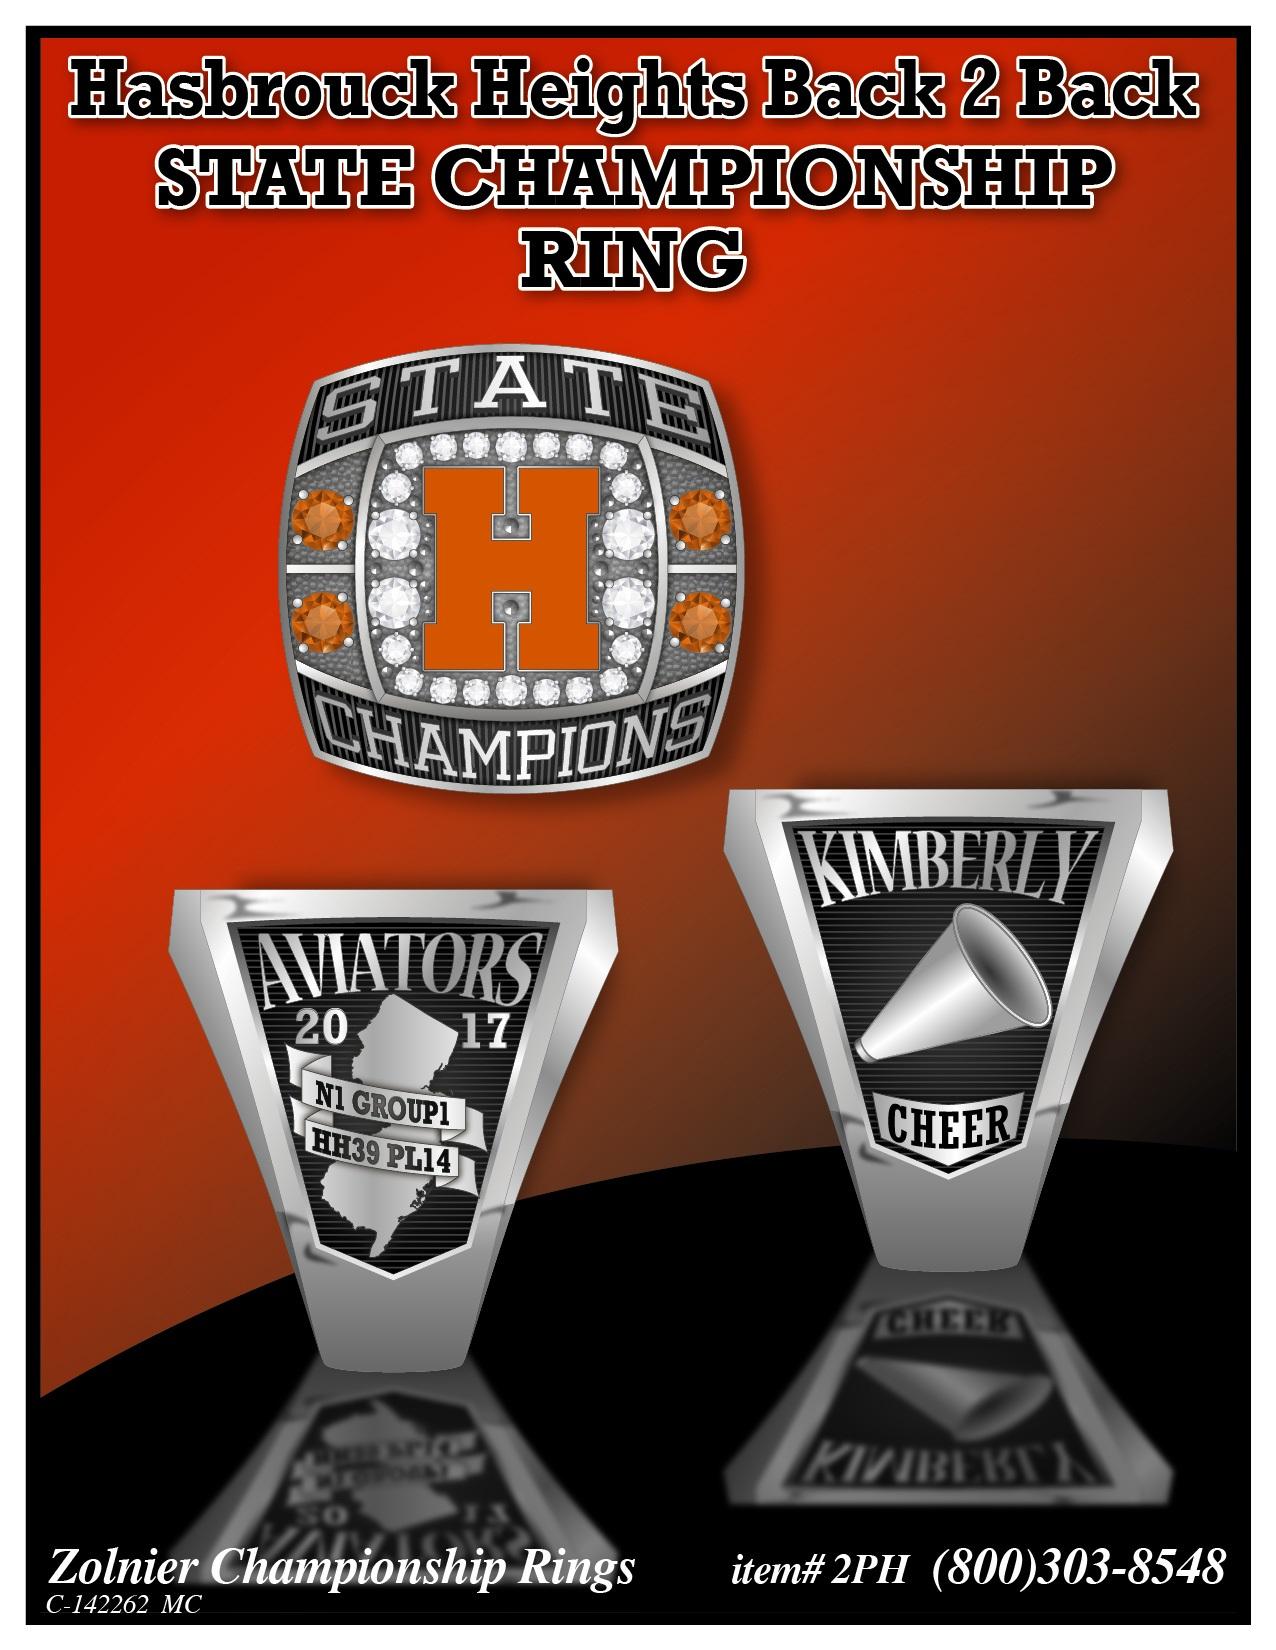 C-142262 Hasbrouck Heights Cheer Ring